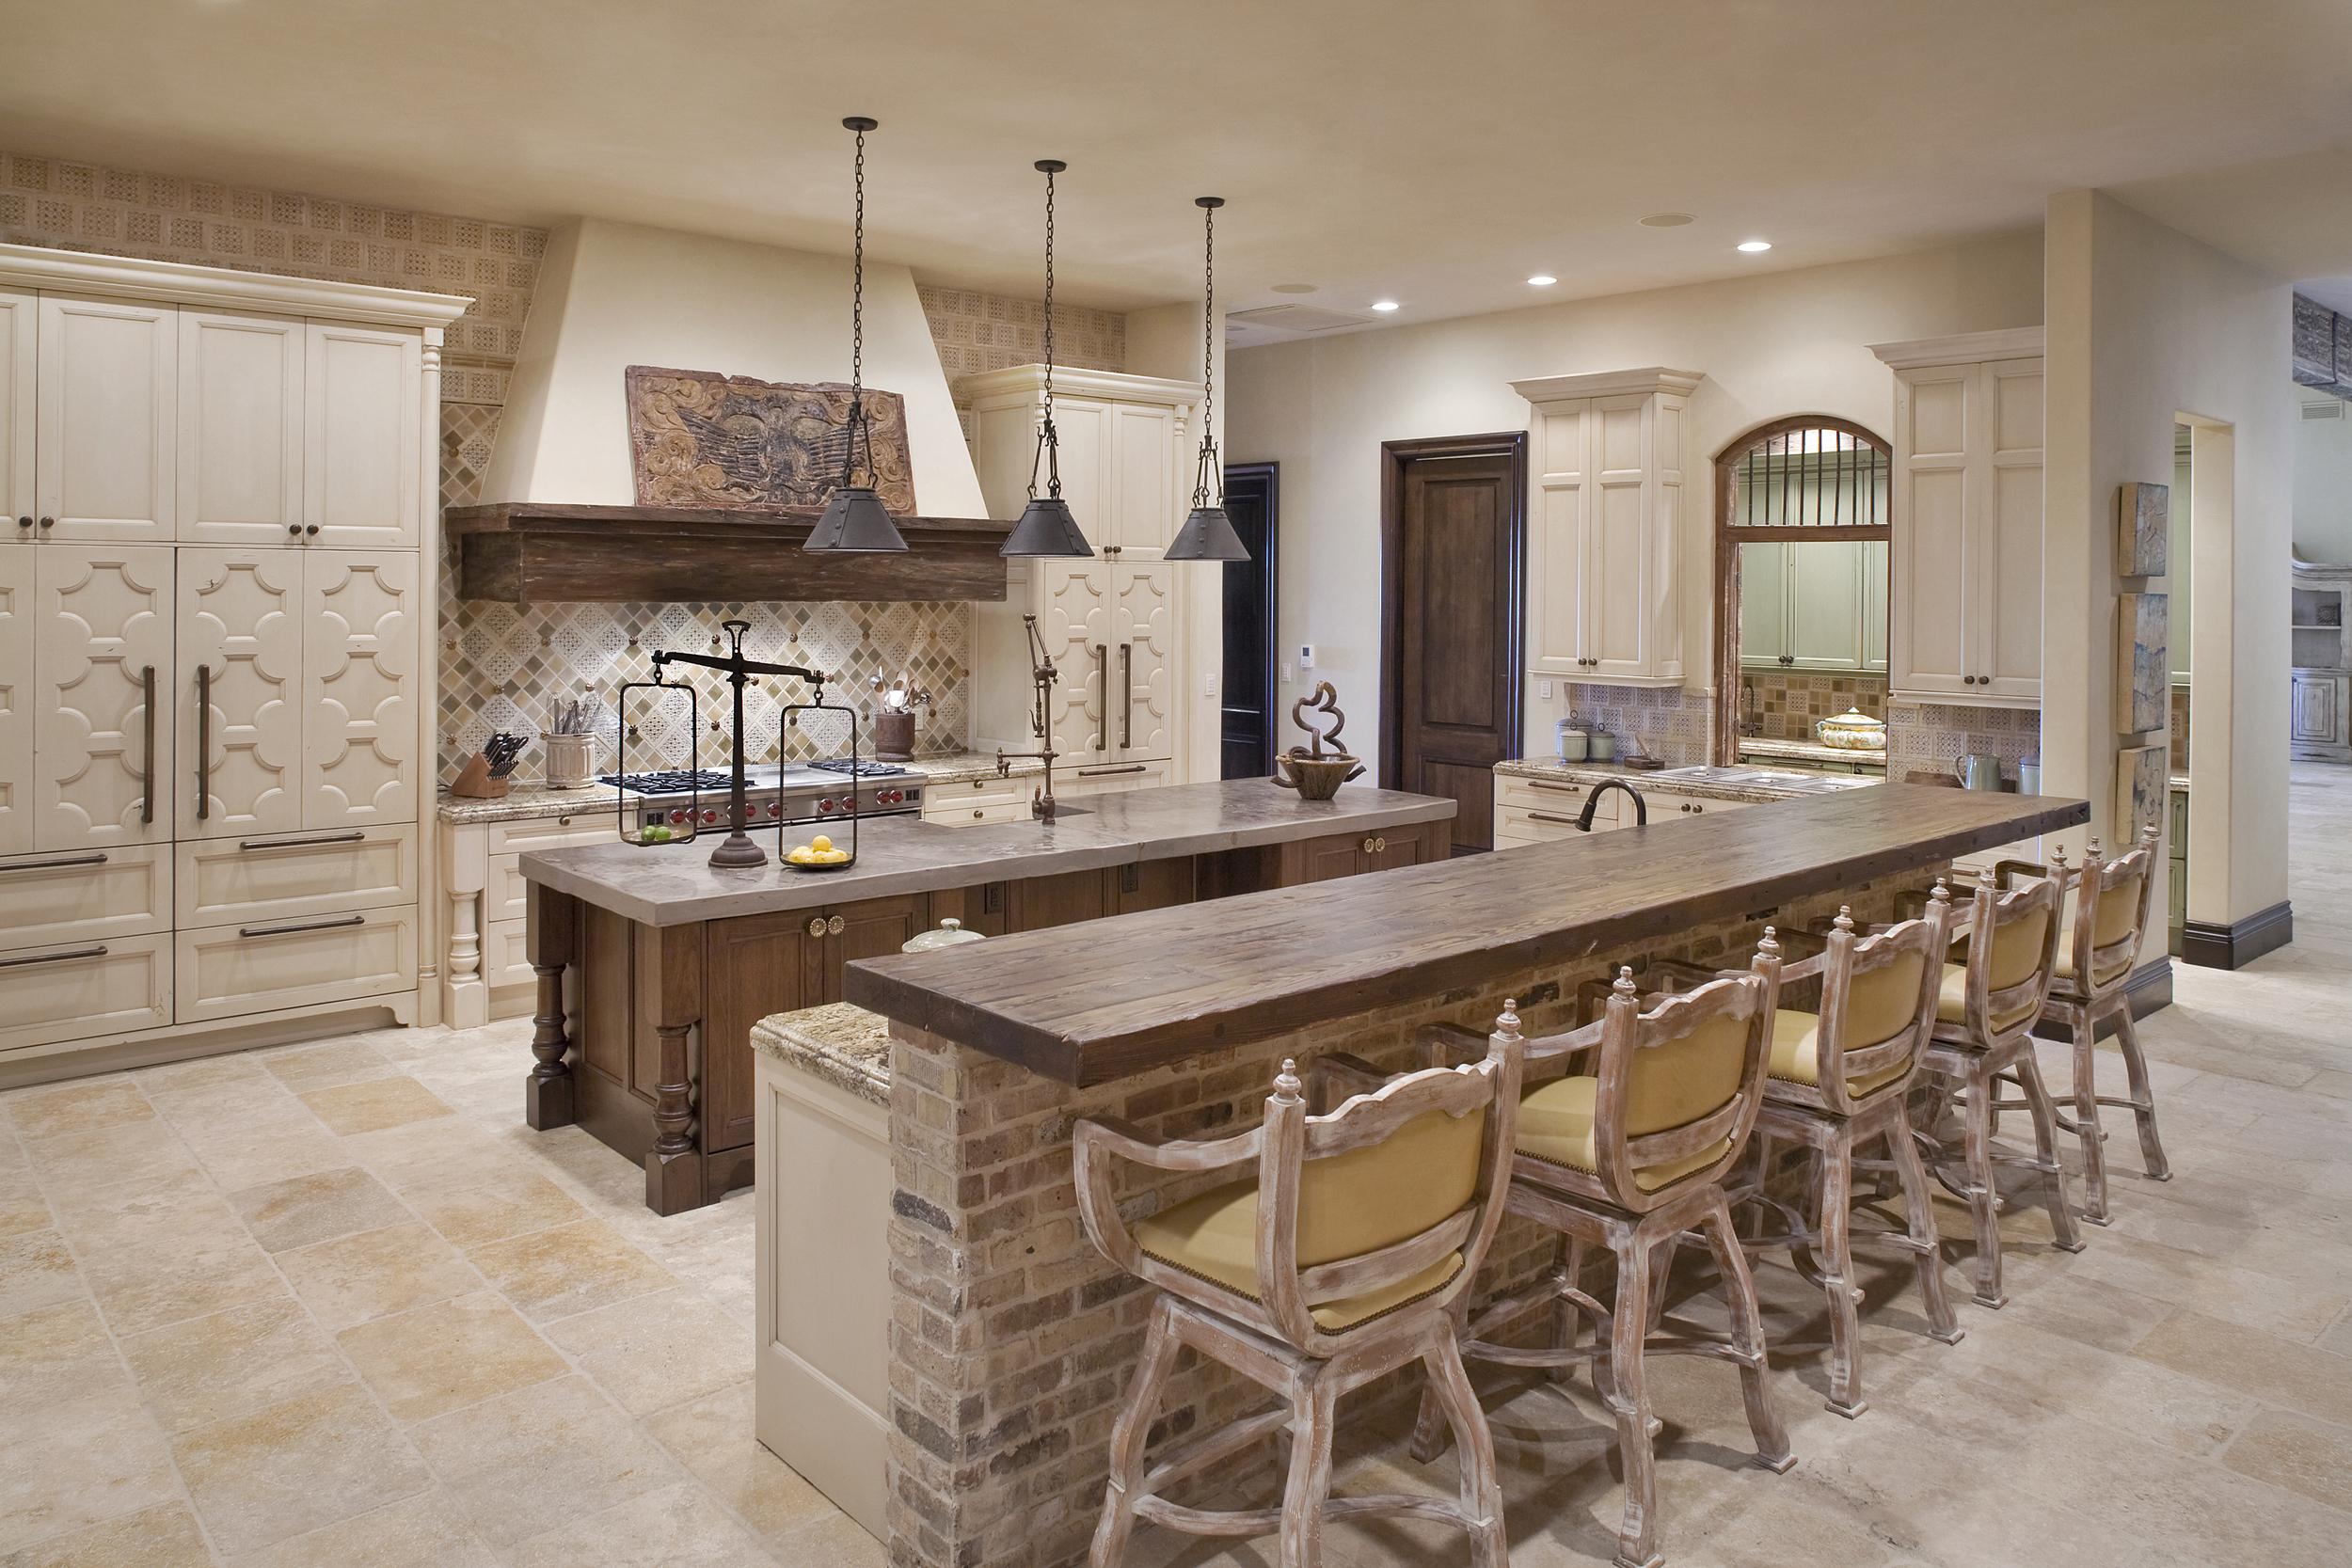 7cs kitchen.jpg